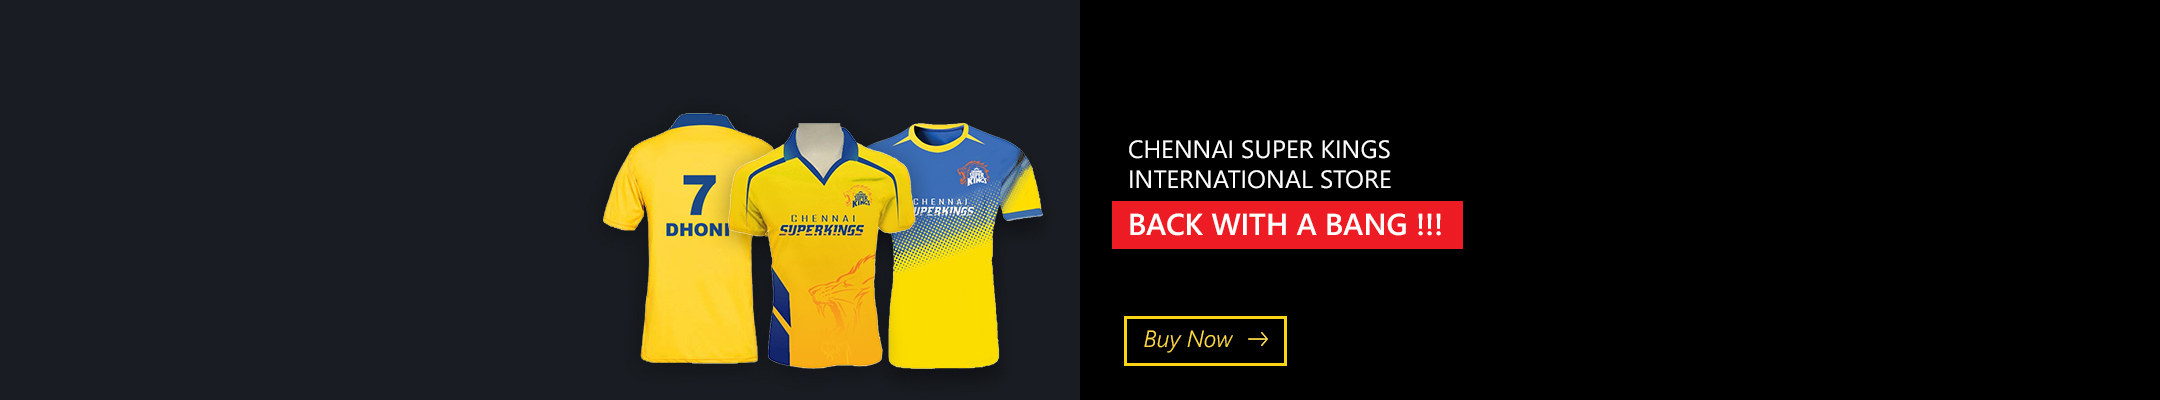 Chennai Super Kings Internation Store Back with a Bang!